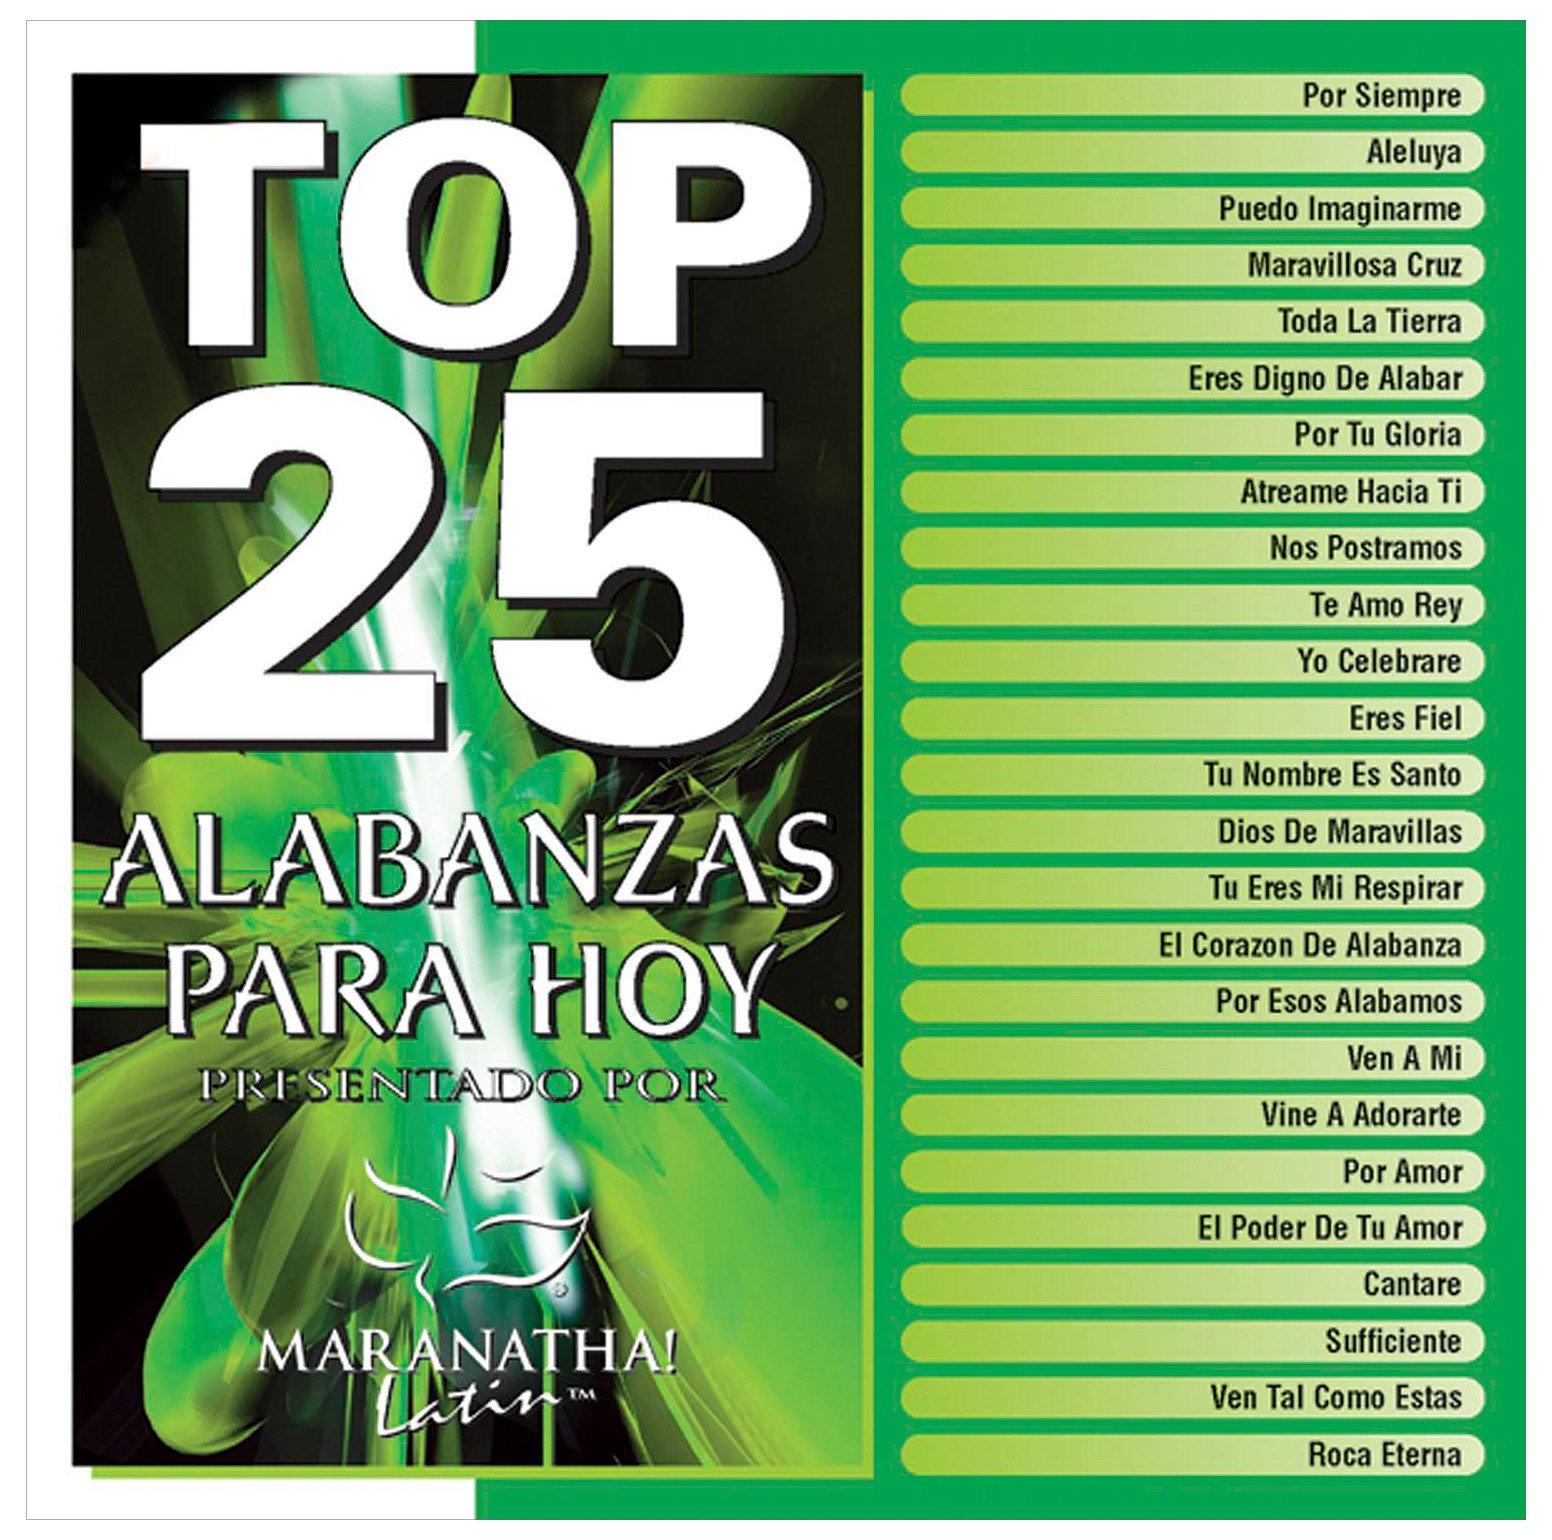 Top 25 Alabanzas Para Hoy [2 CD]